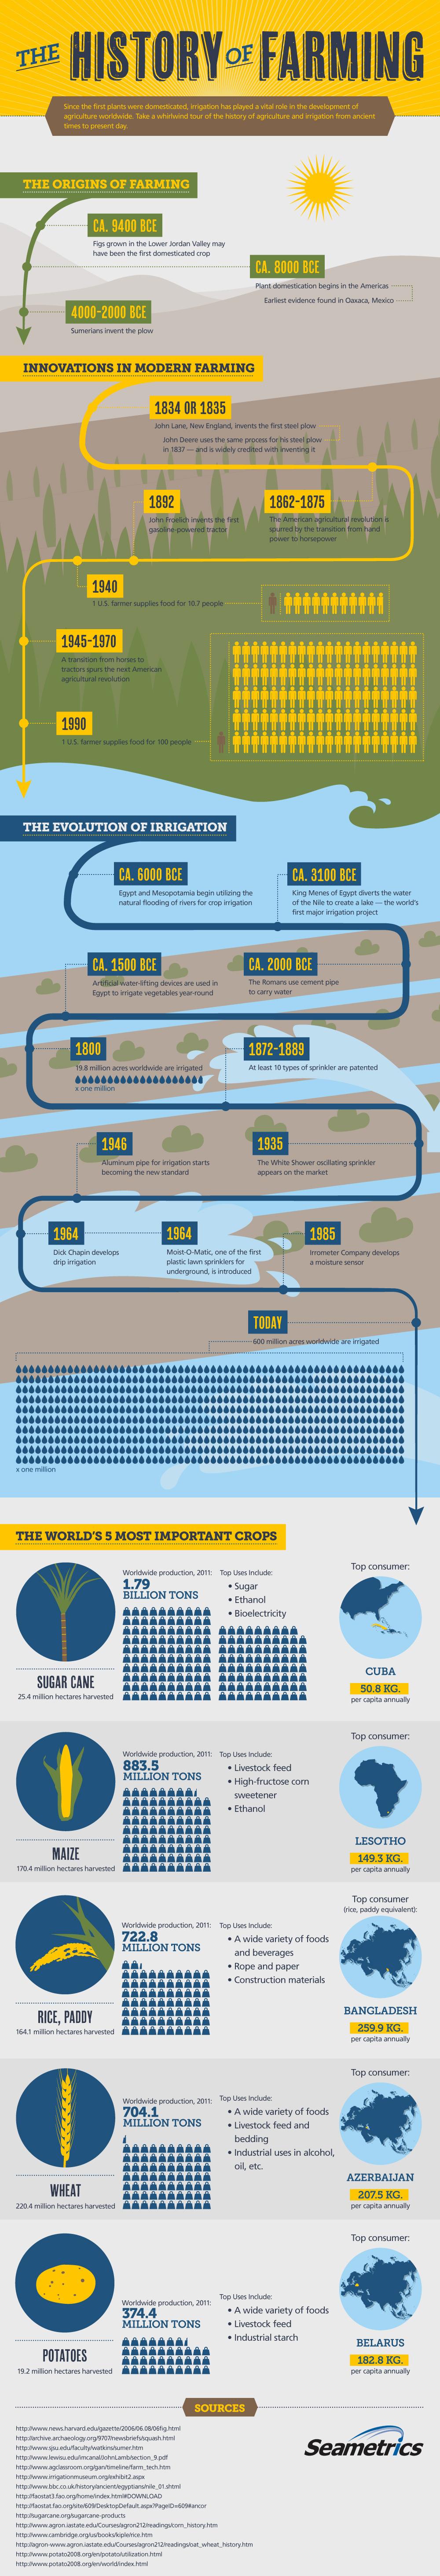 History of Farming